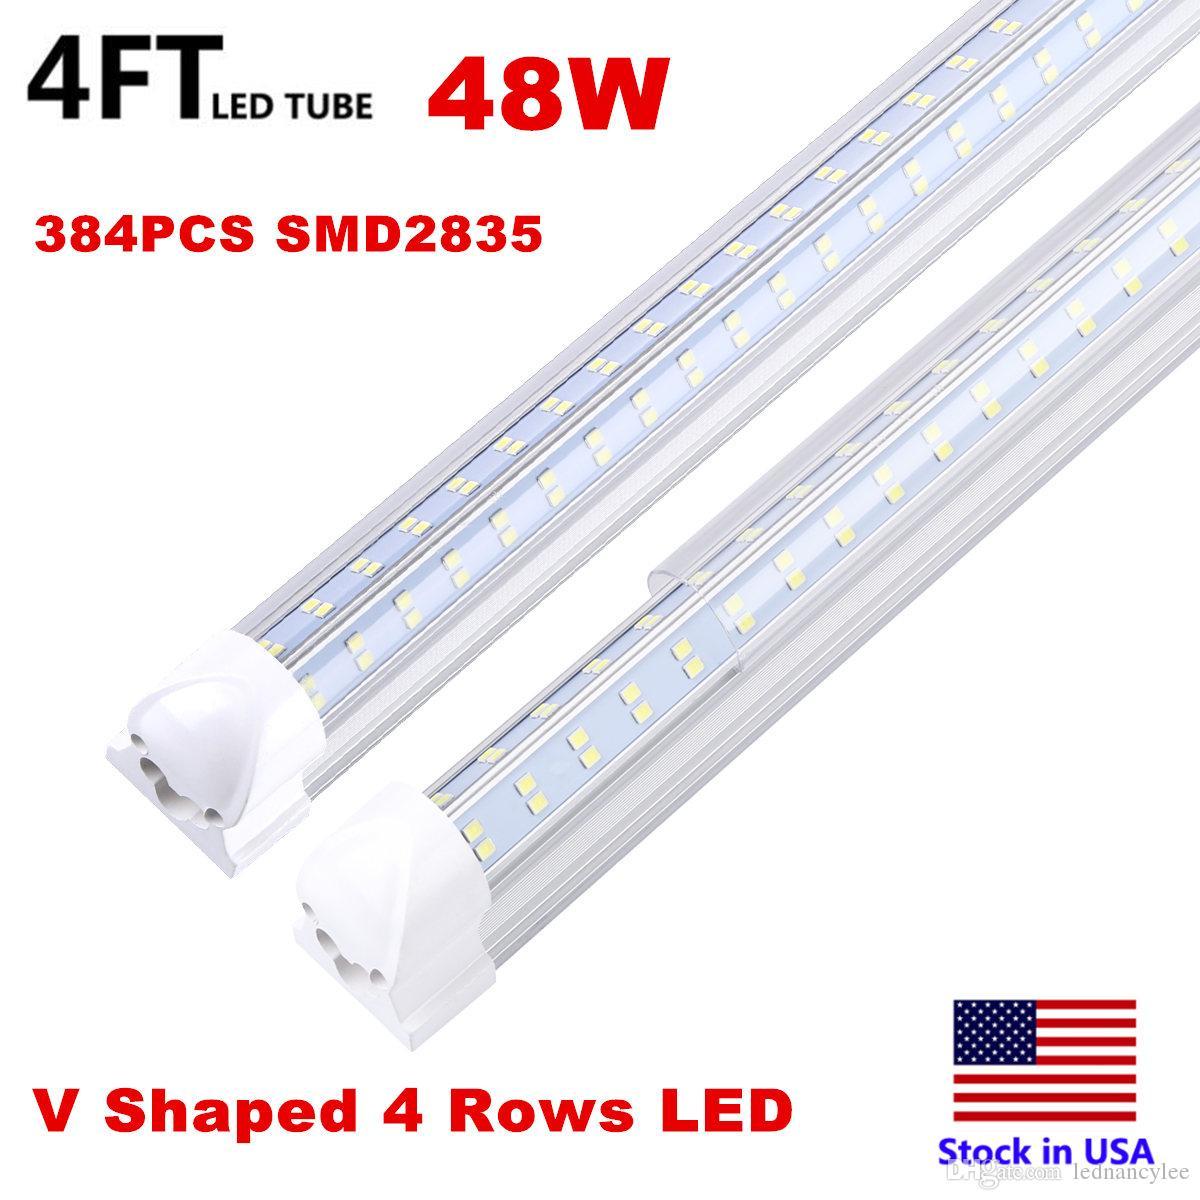 4ft 8ft أضواء LED على شكل حرف V متكامل LED أنبوب مصابيح 120W 4 صف المصابيح SMD2835 LED أضواء 100LM / W الأسهم في الولايات المتحدة الأمريكية